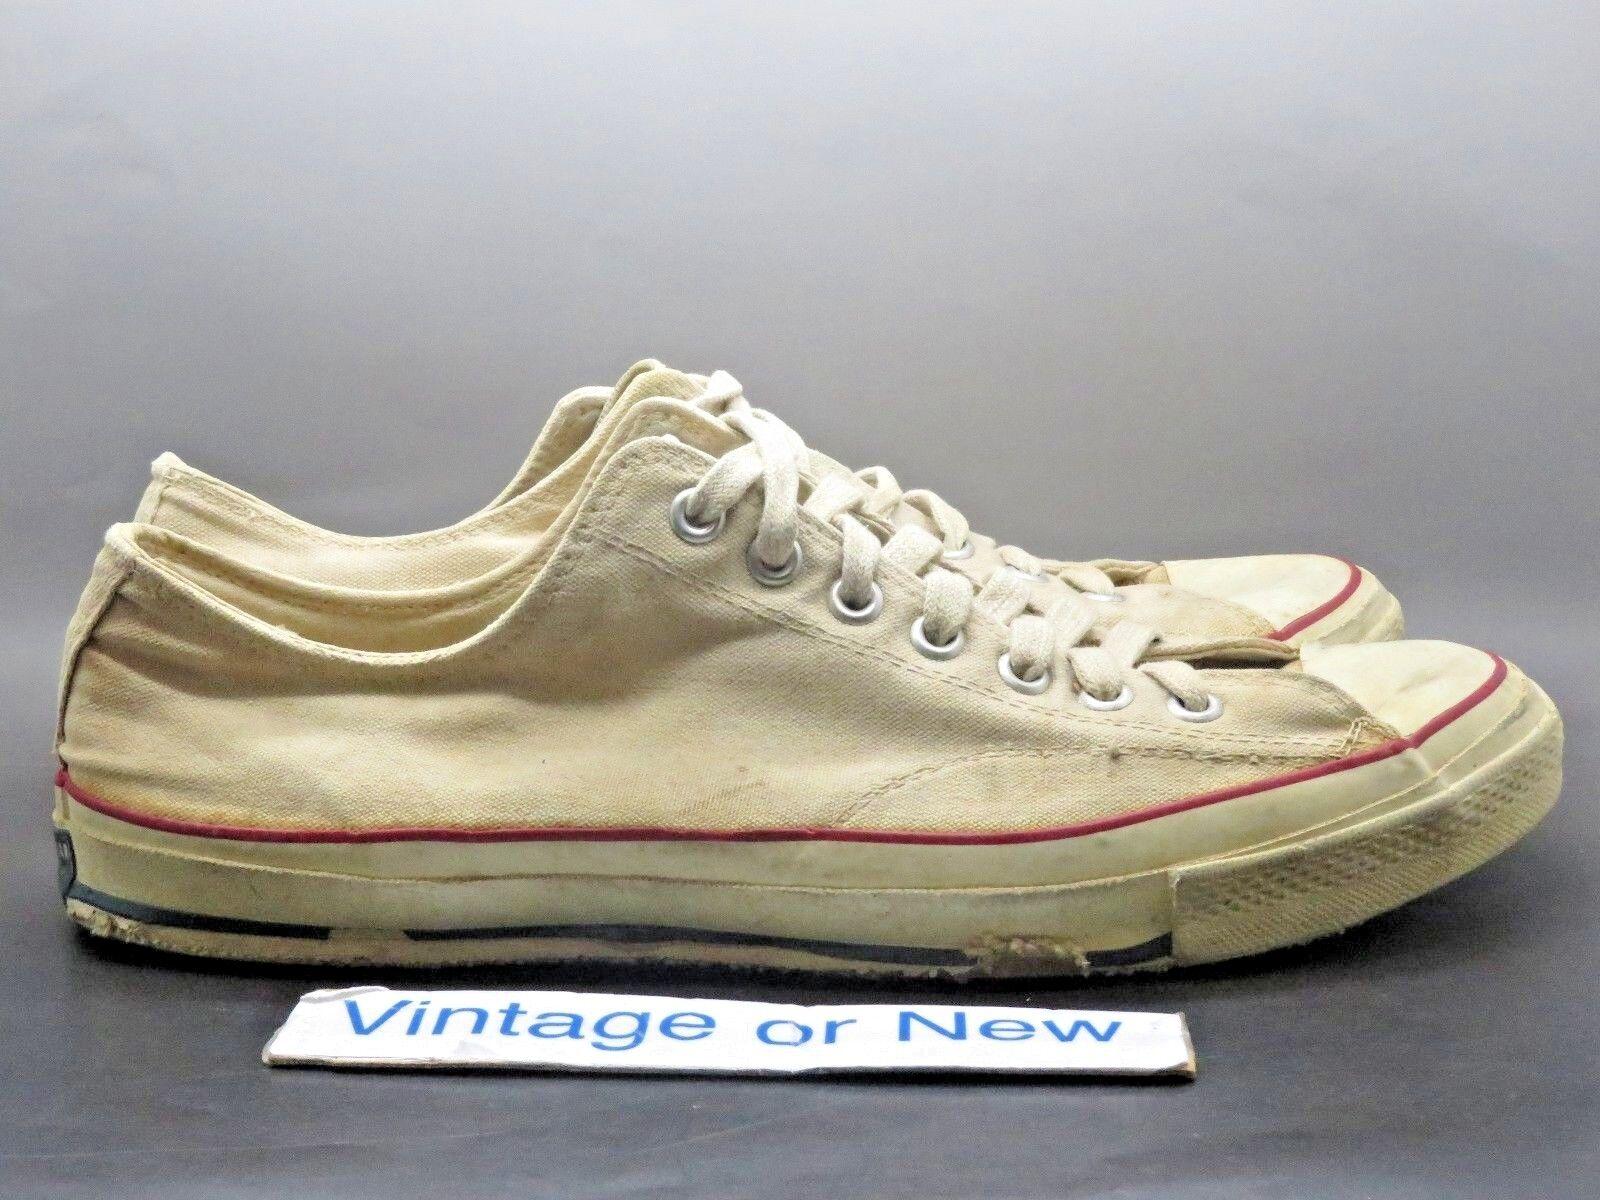 VTG Original 1960 60's Converse All Star Low OX White Canvas Blue Label sz 13